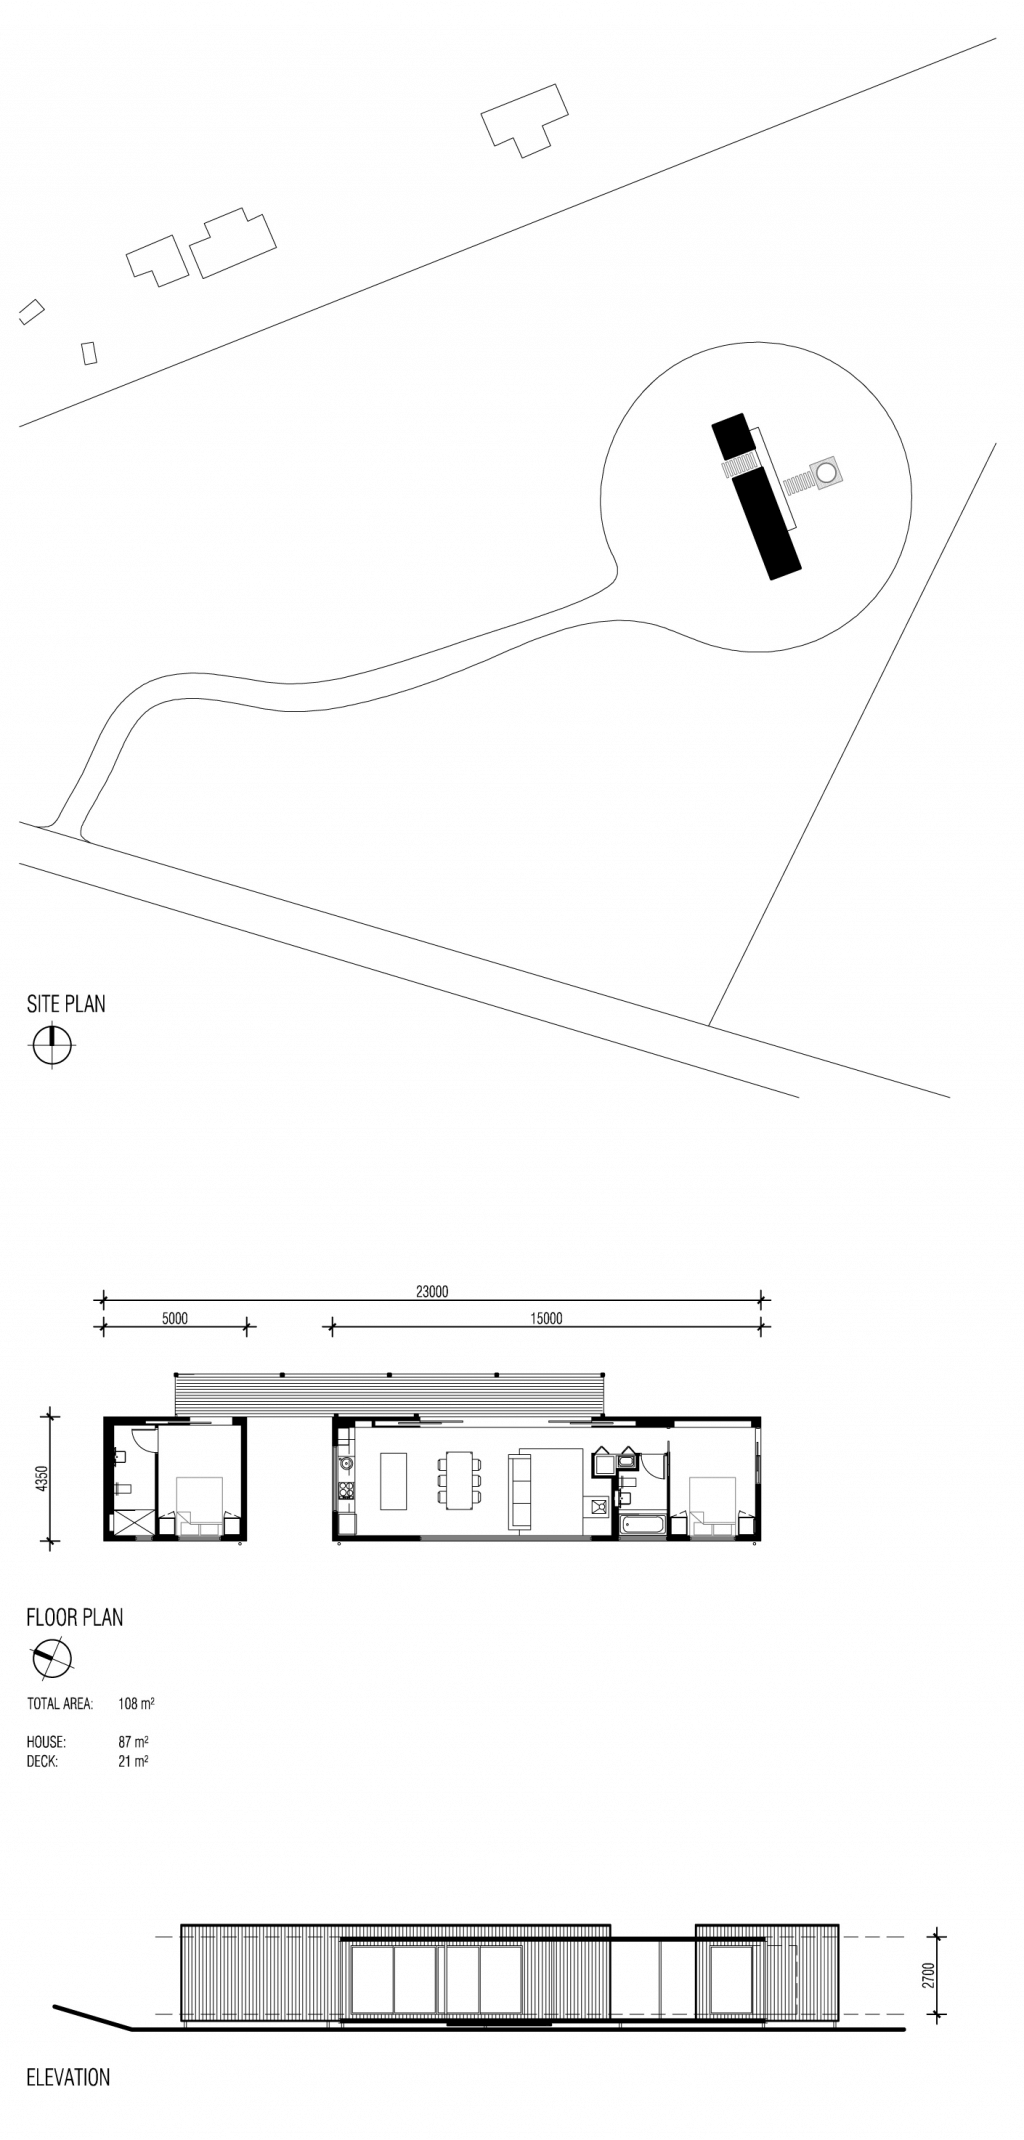 Musk Prefab Cabin by Modscape (via Lunchbox Architect)